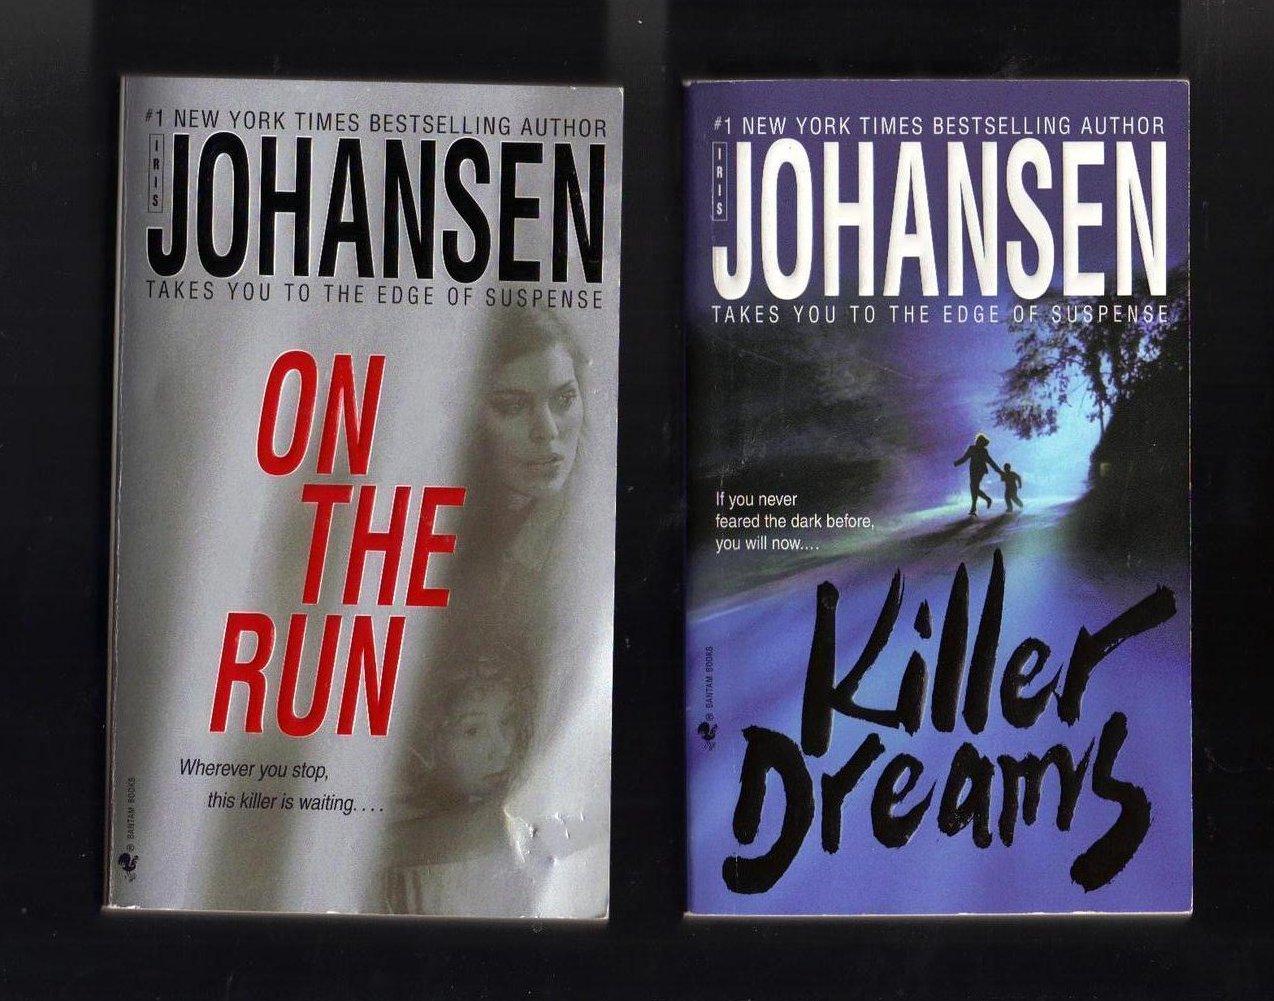 Iris Johansen On the Run and Killer Dreams PB Lot of 2 Books